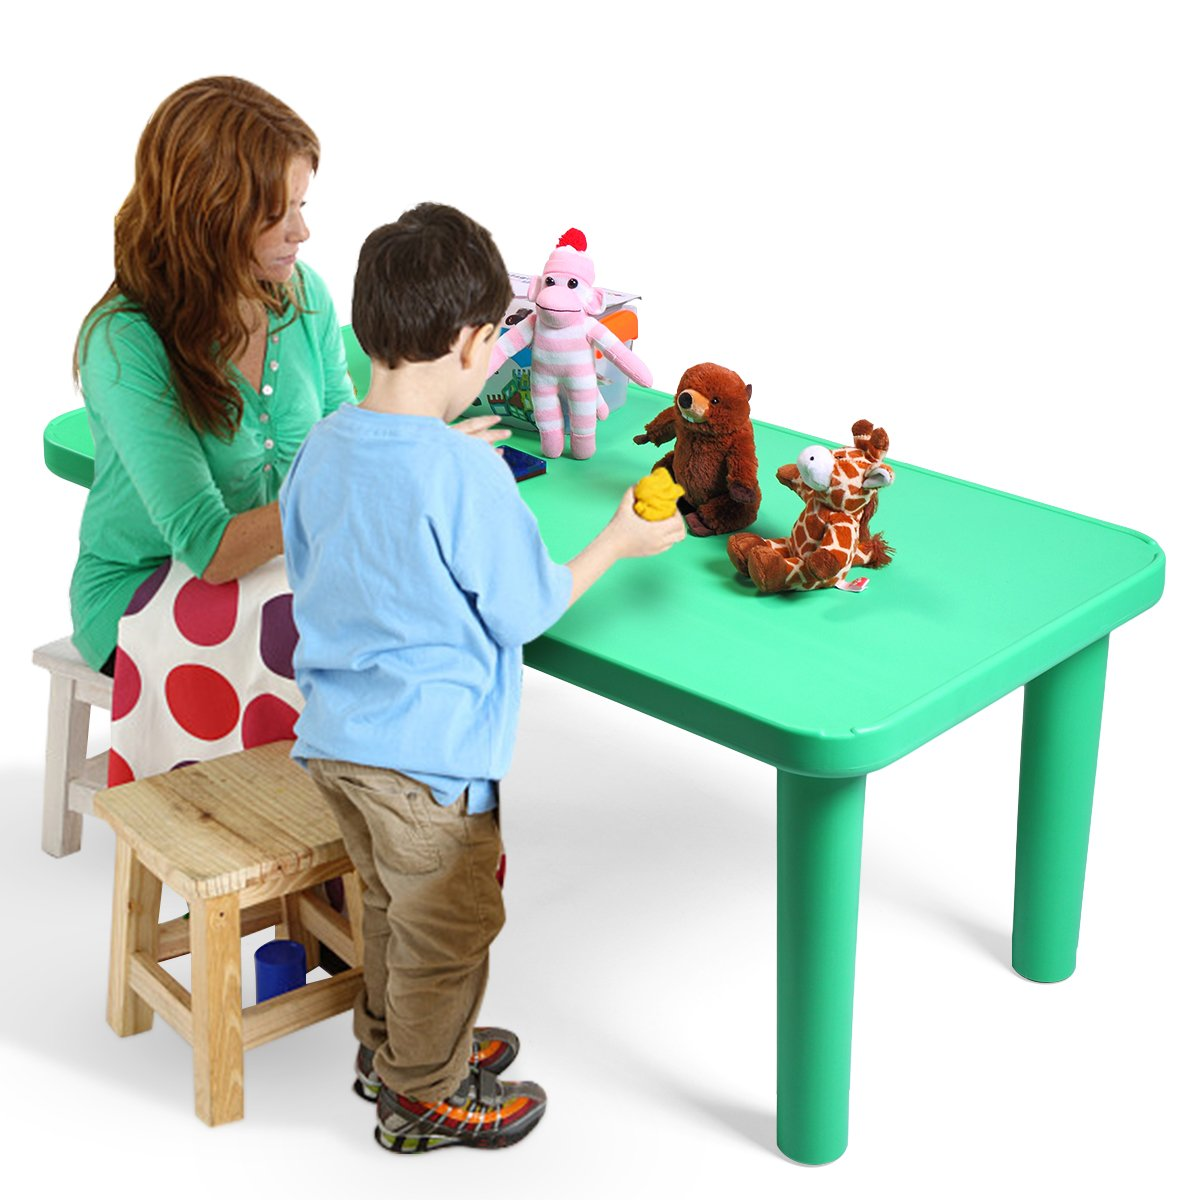 LAZYMOON Green Rectangular Kids Plastic Table Portable Activity School Home Furniture for Toddler Children